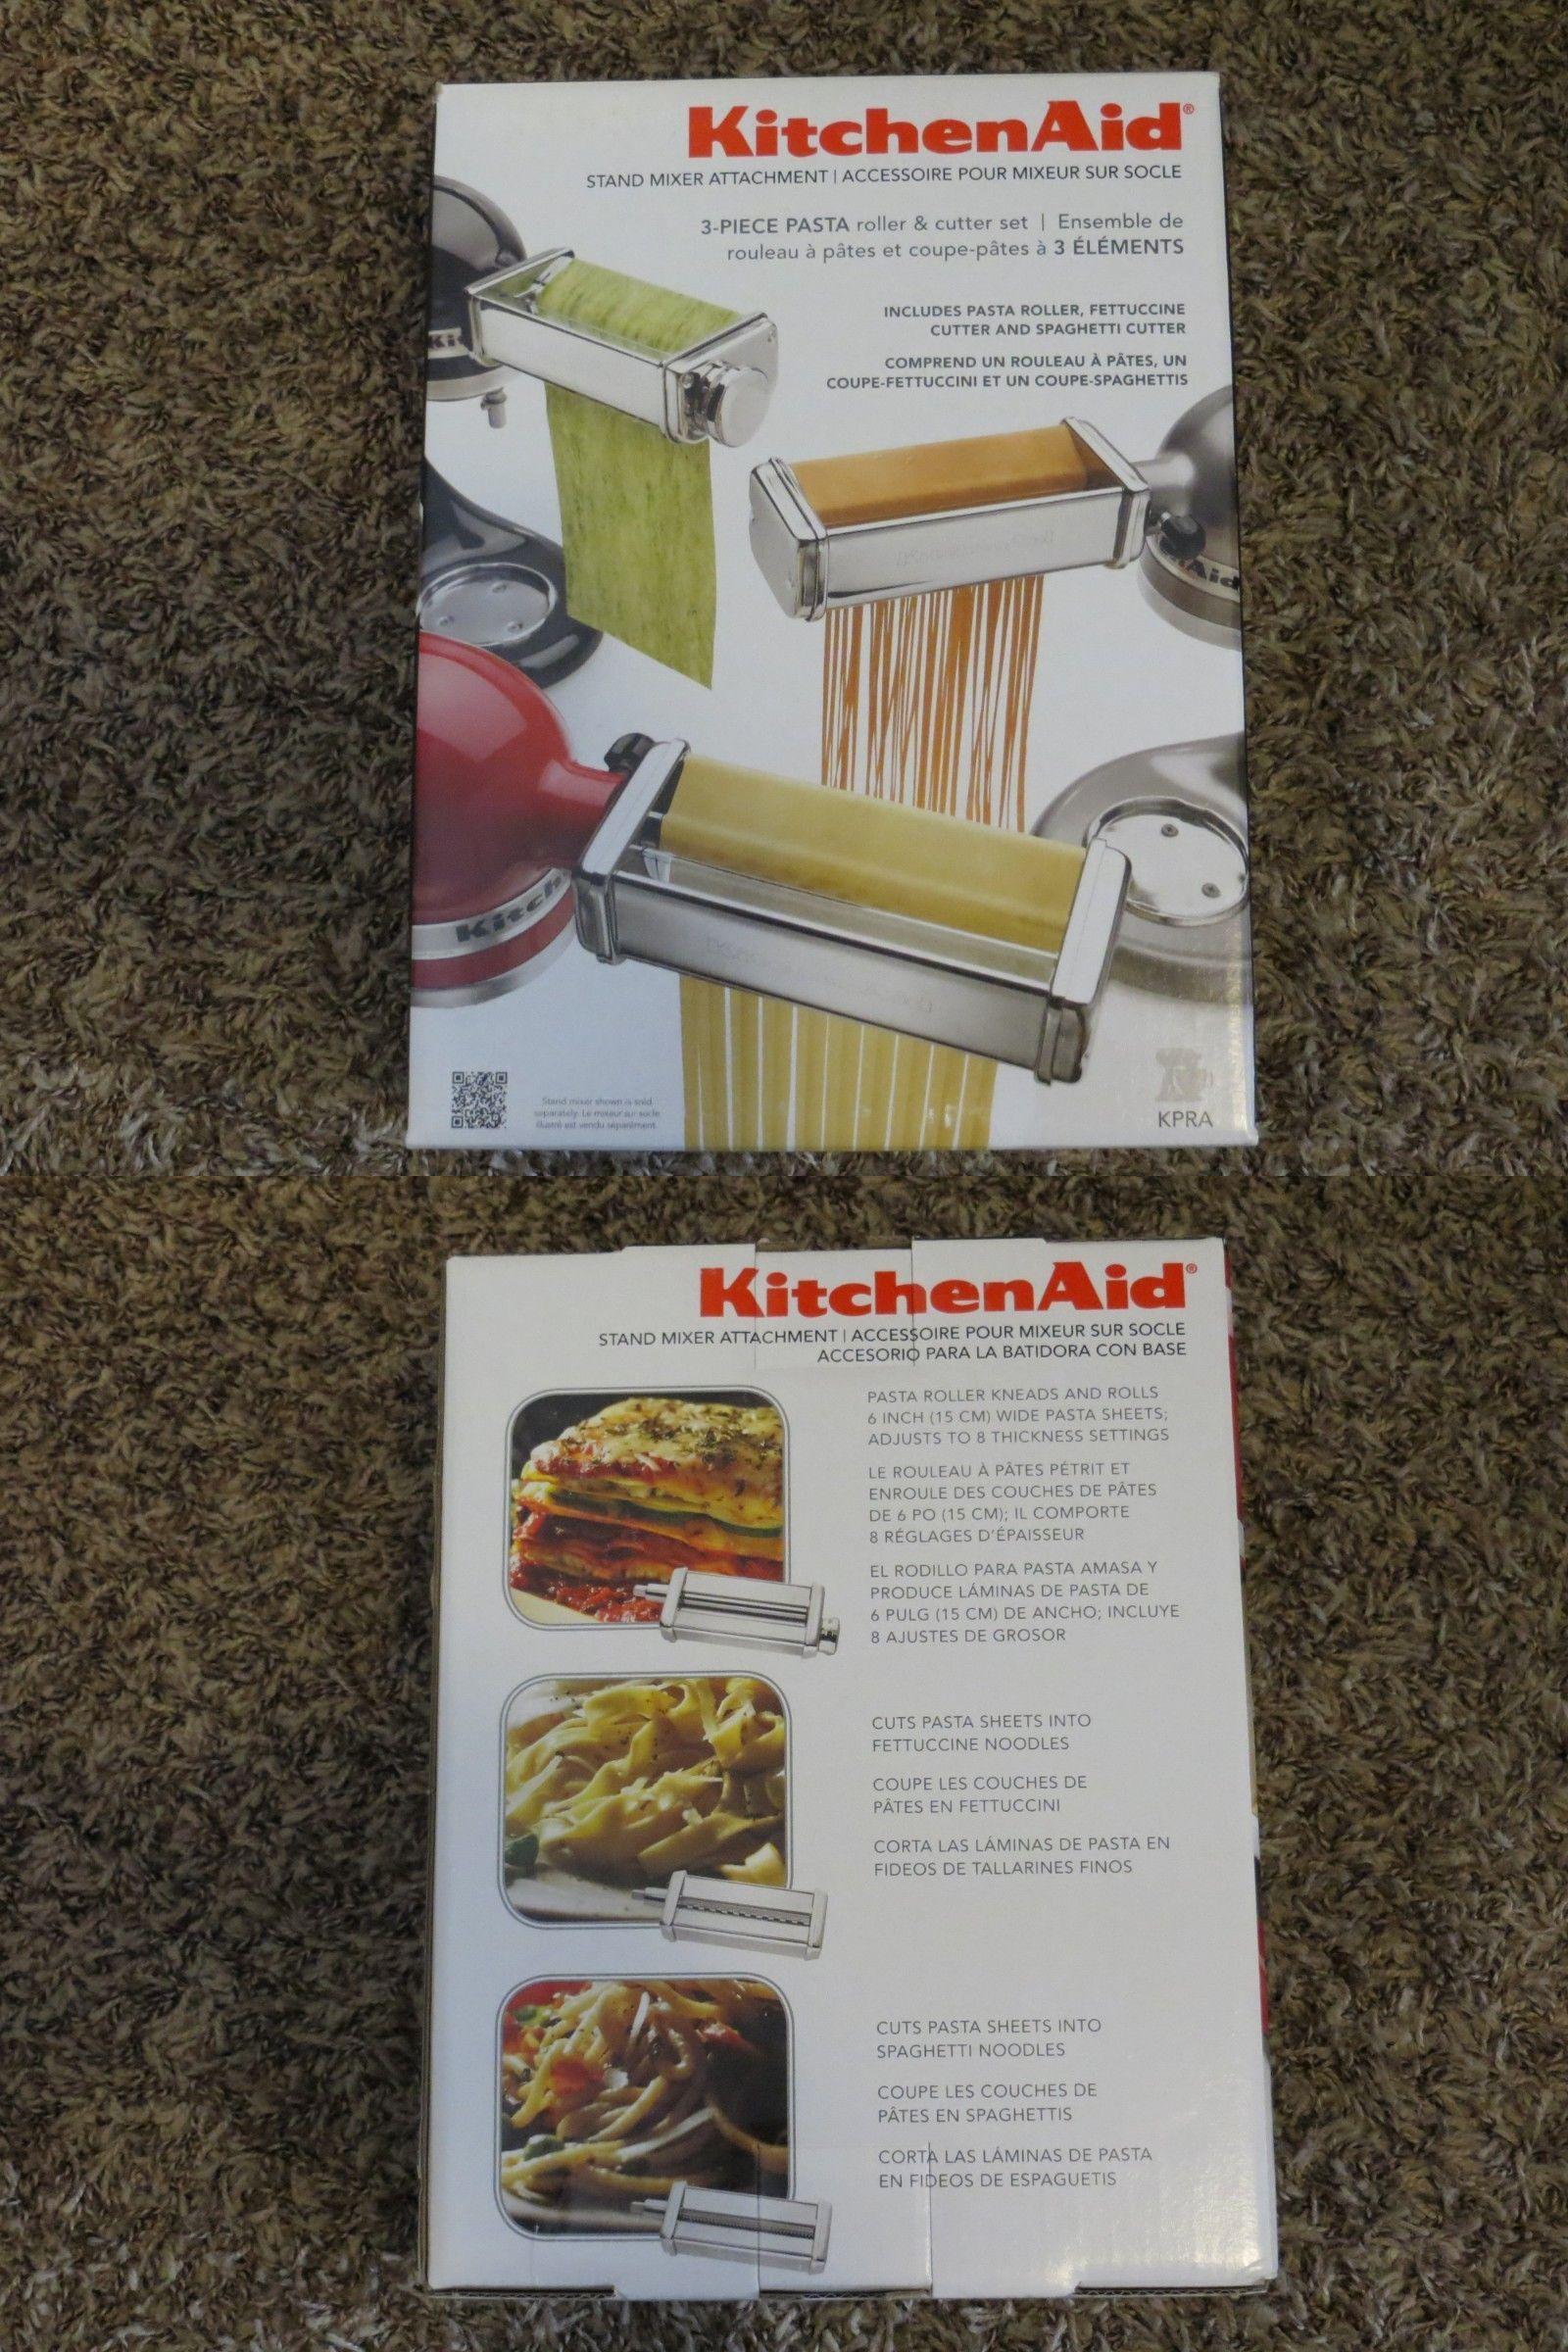 pasta makers 20680 kitchenaid kpra pasta roller and cutter set 3 rh pinterest com